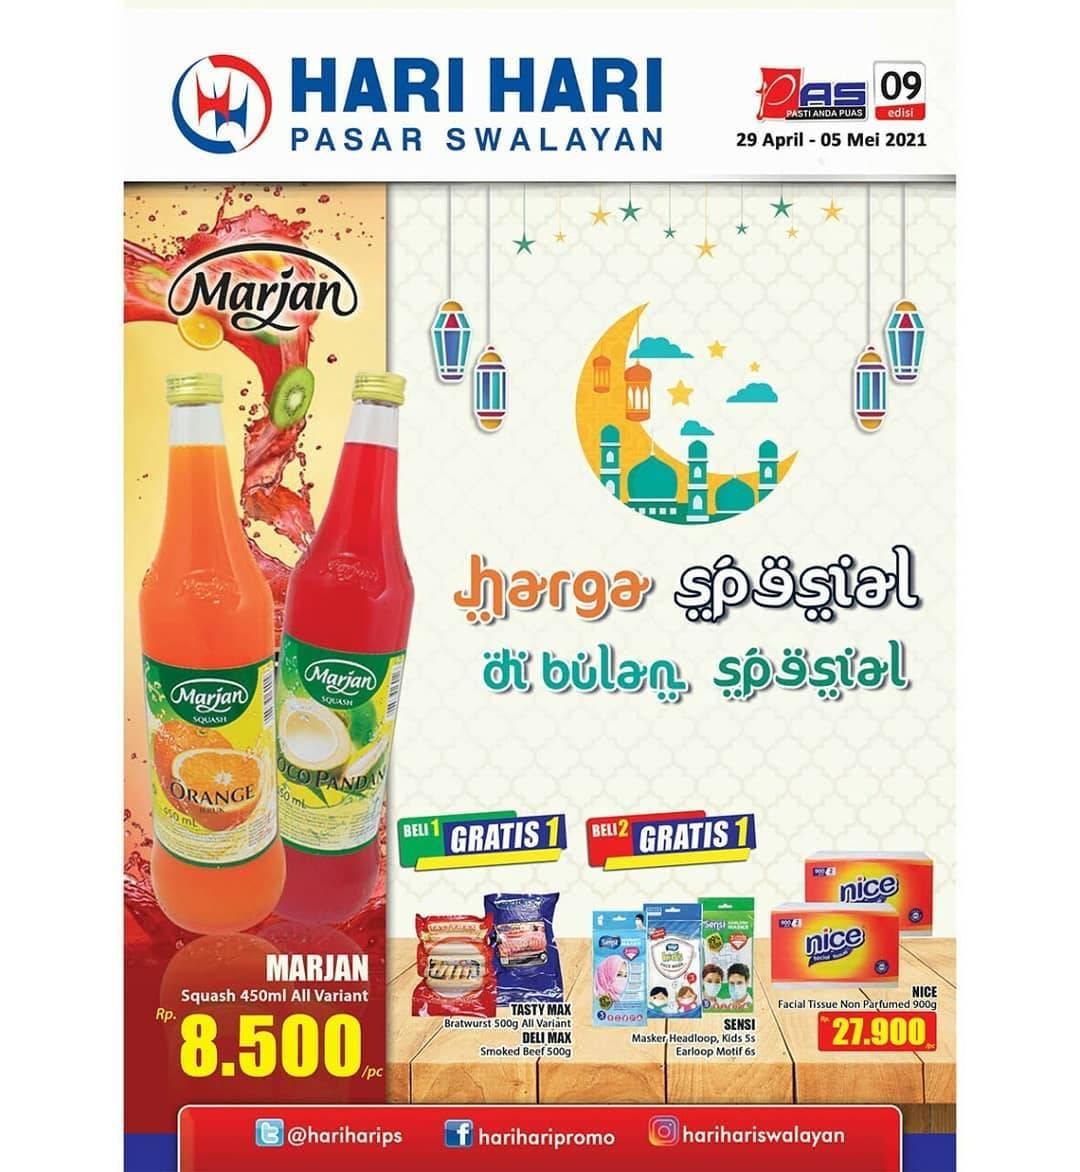 Diskon Katalog Promo Hari Hari Swalayan Promo PAS Periode 29 April - 5 Mei 2021